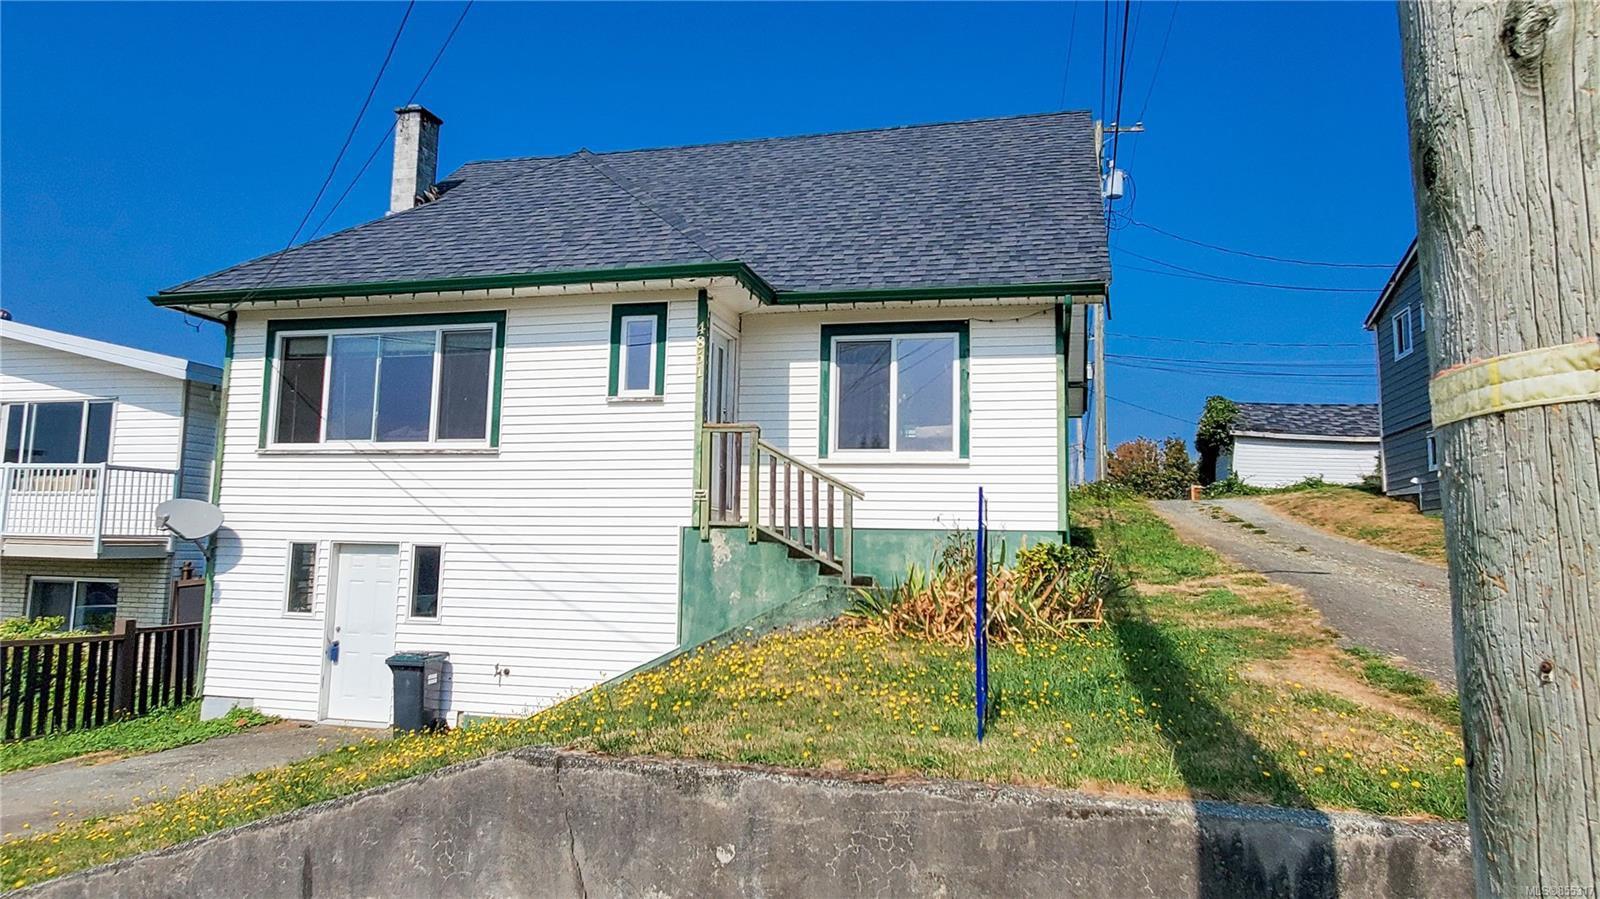 Main Photo: 4861 Athol St in : PA Port Alberni Single Family Detached for sale (Port Alberni)  : MLS®# 855317